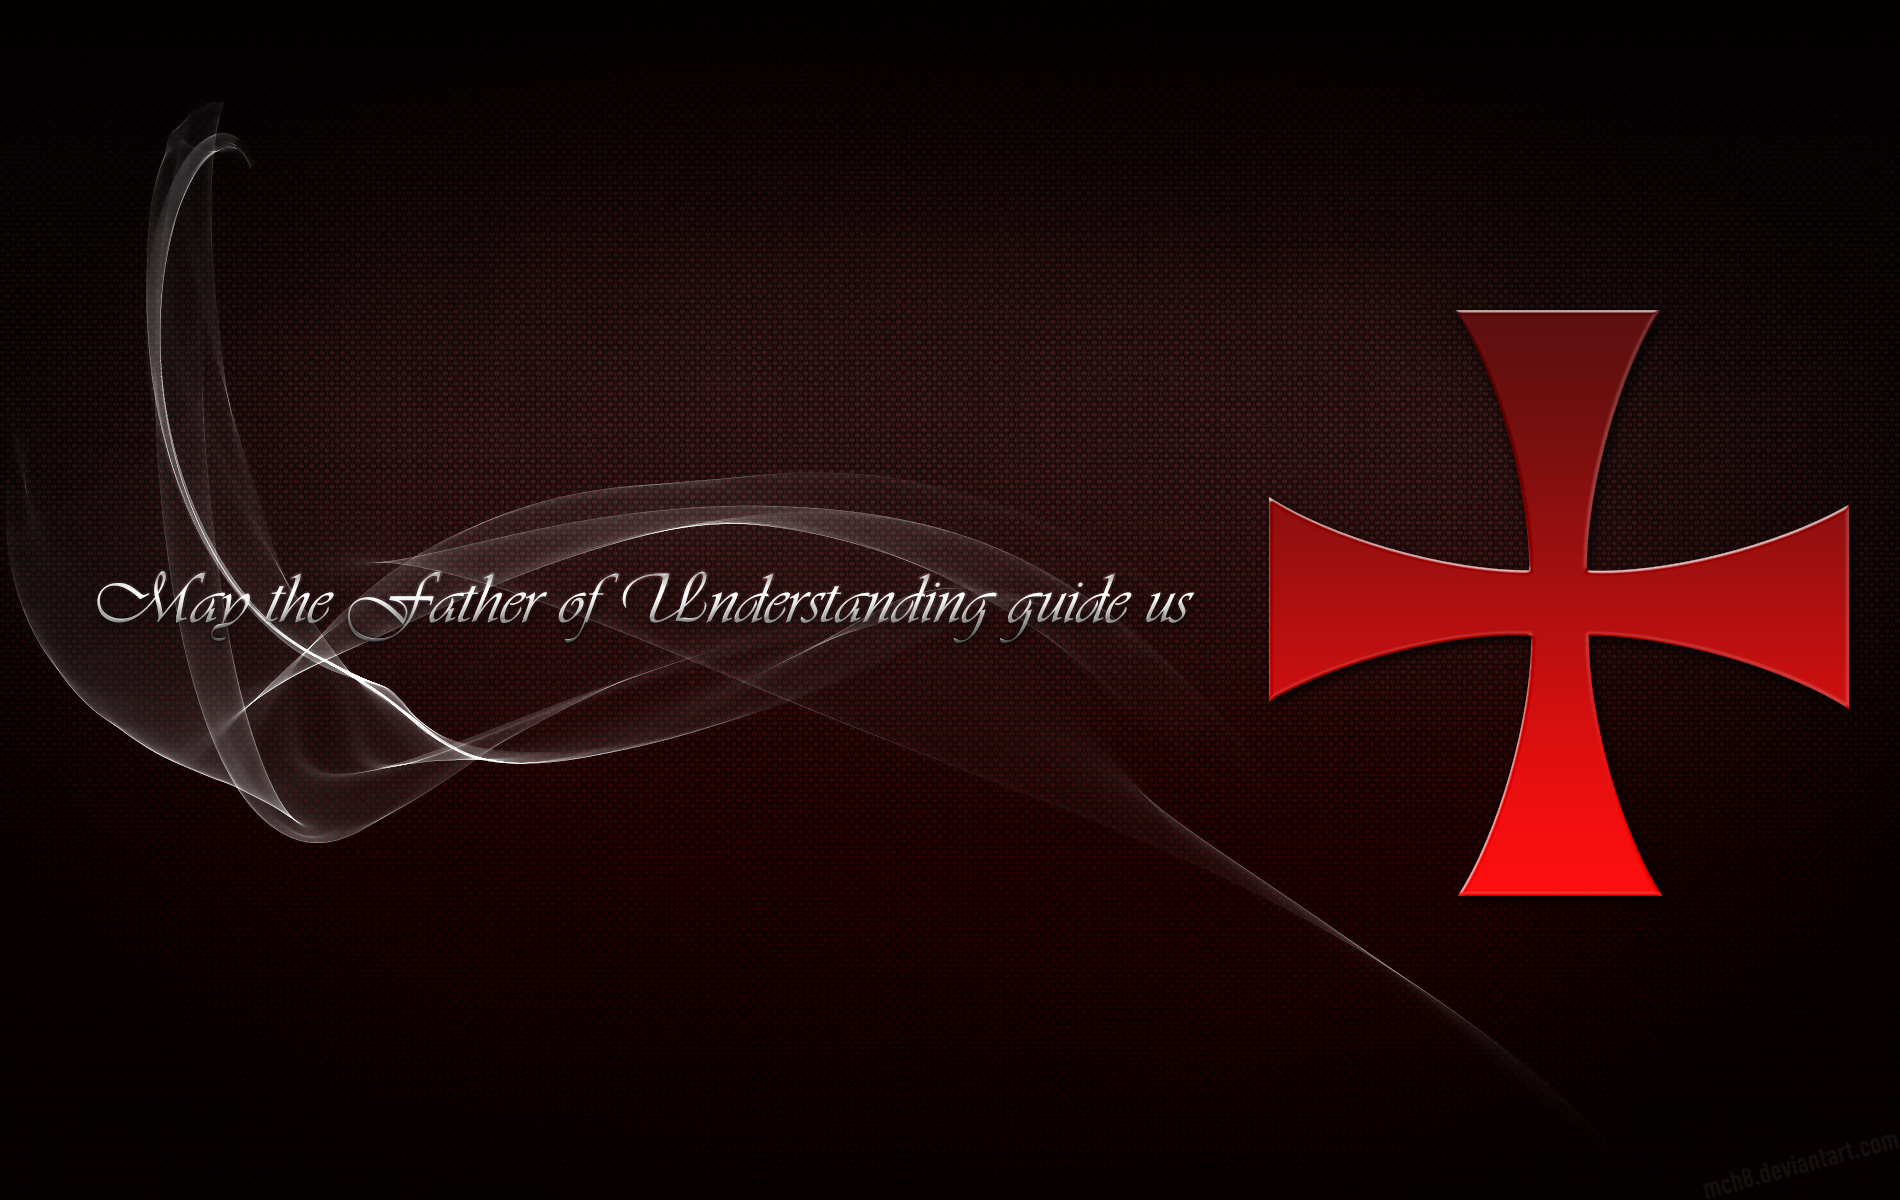 Templar Cross Assassins Creed Templars by mch8 on De...